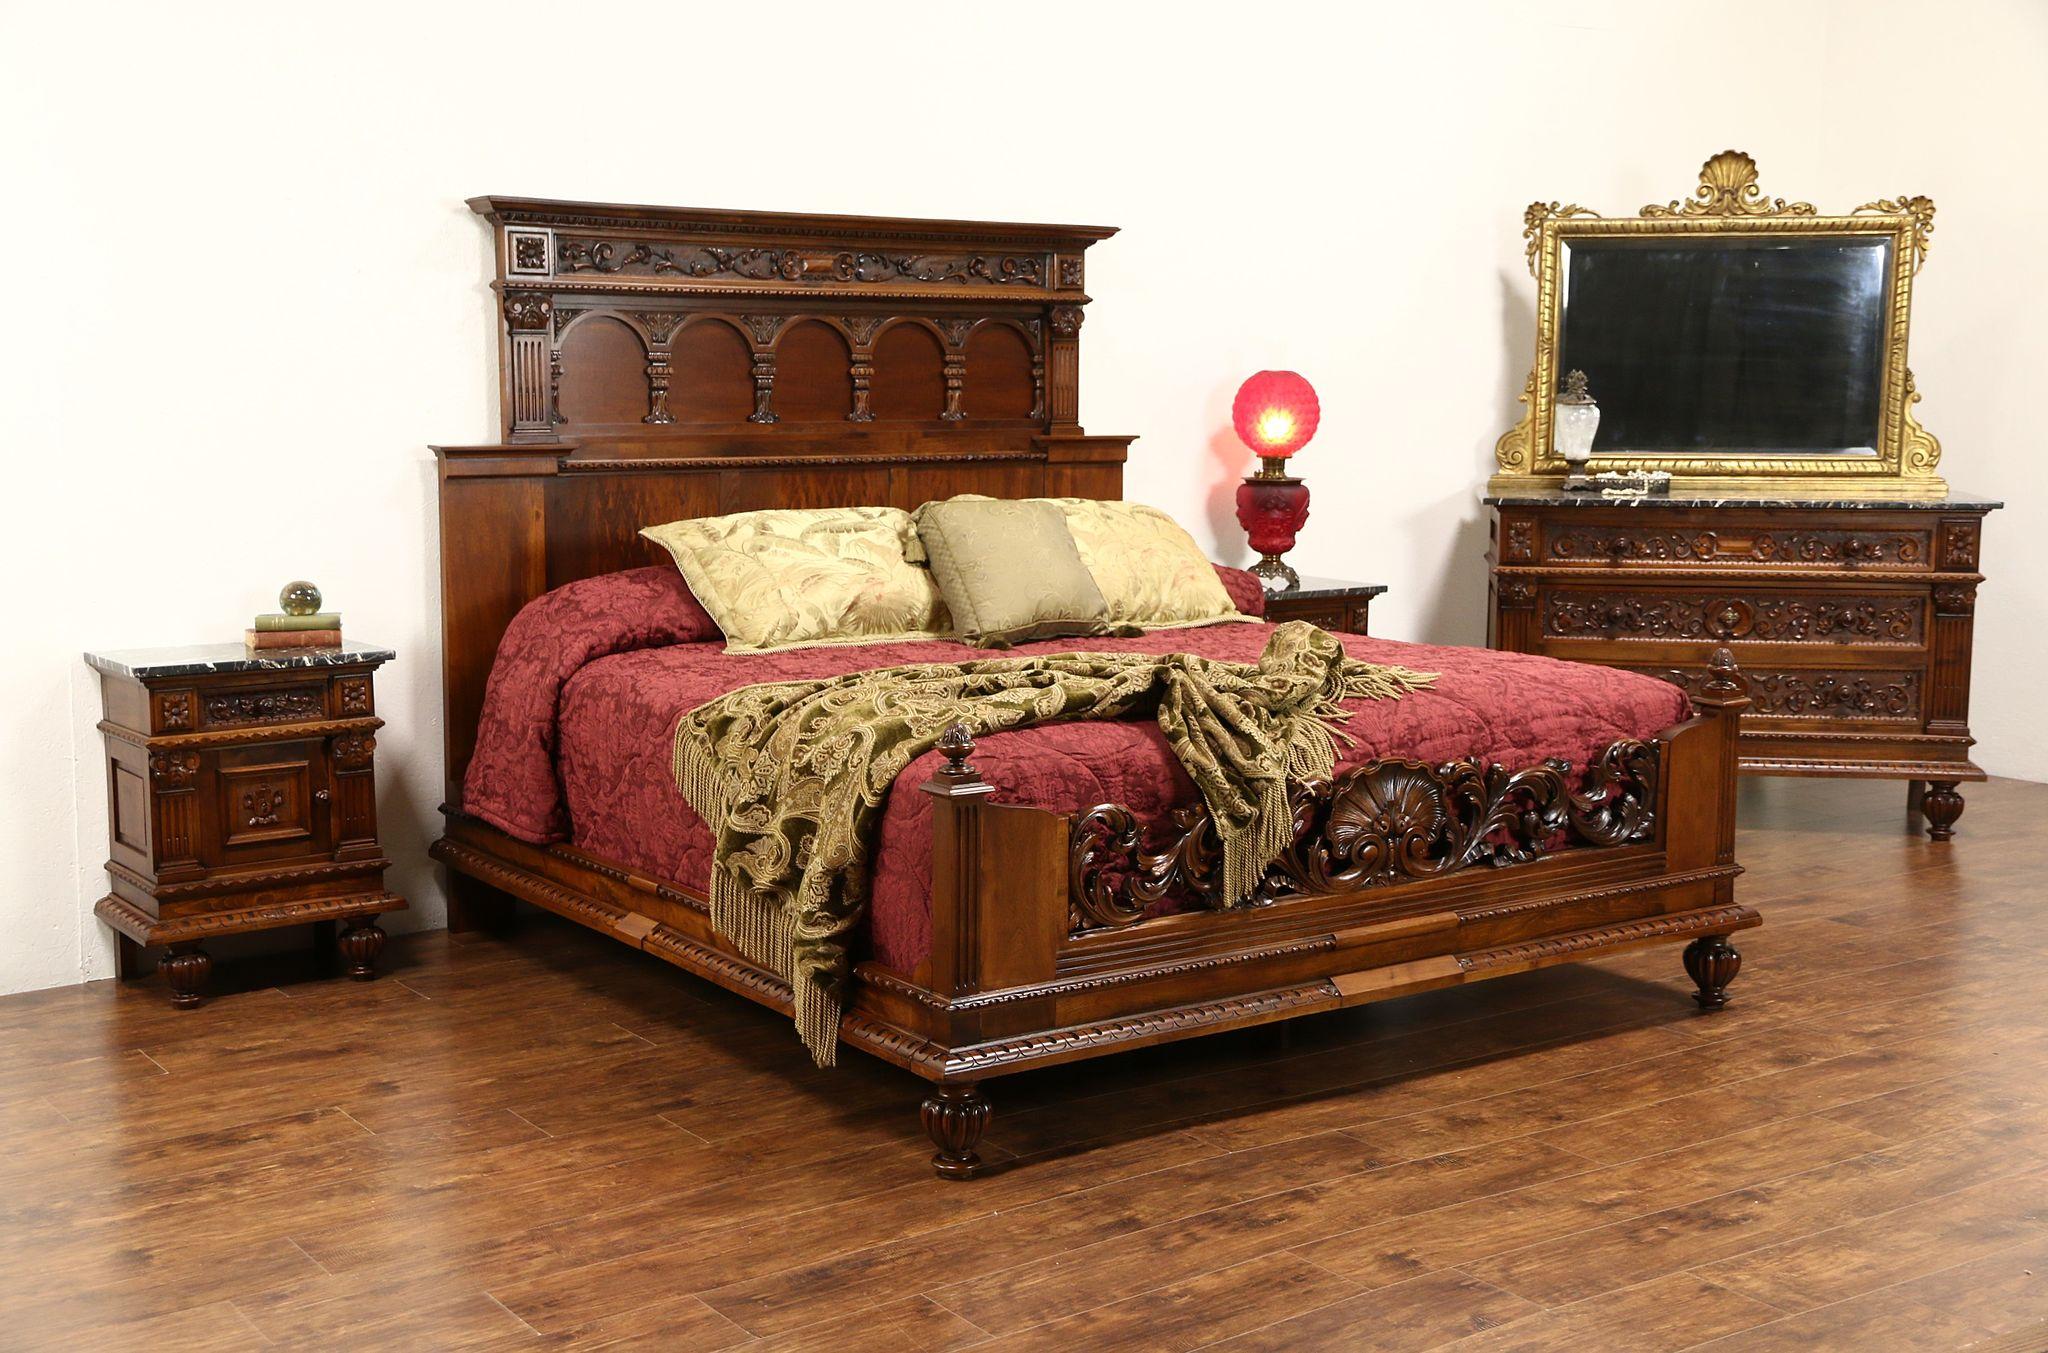 Italian Renaissance 1900u0027s Antique King Size 4 Pc. Bedroom Set Marble Top  Chests